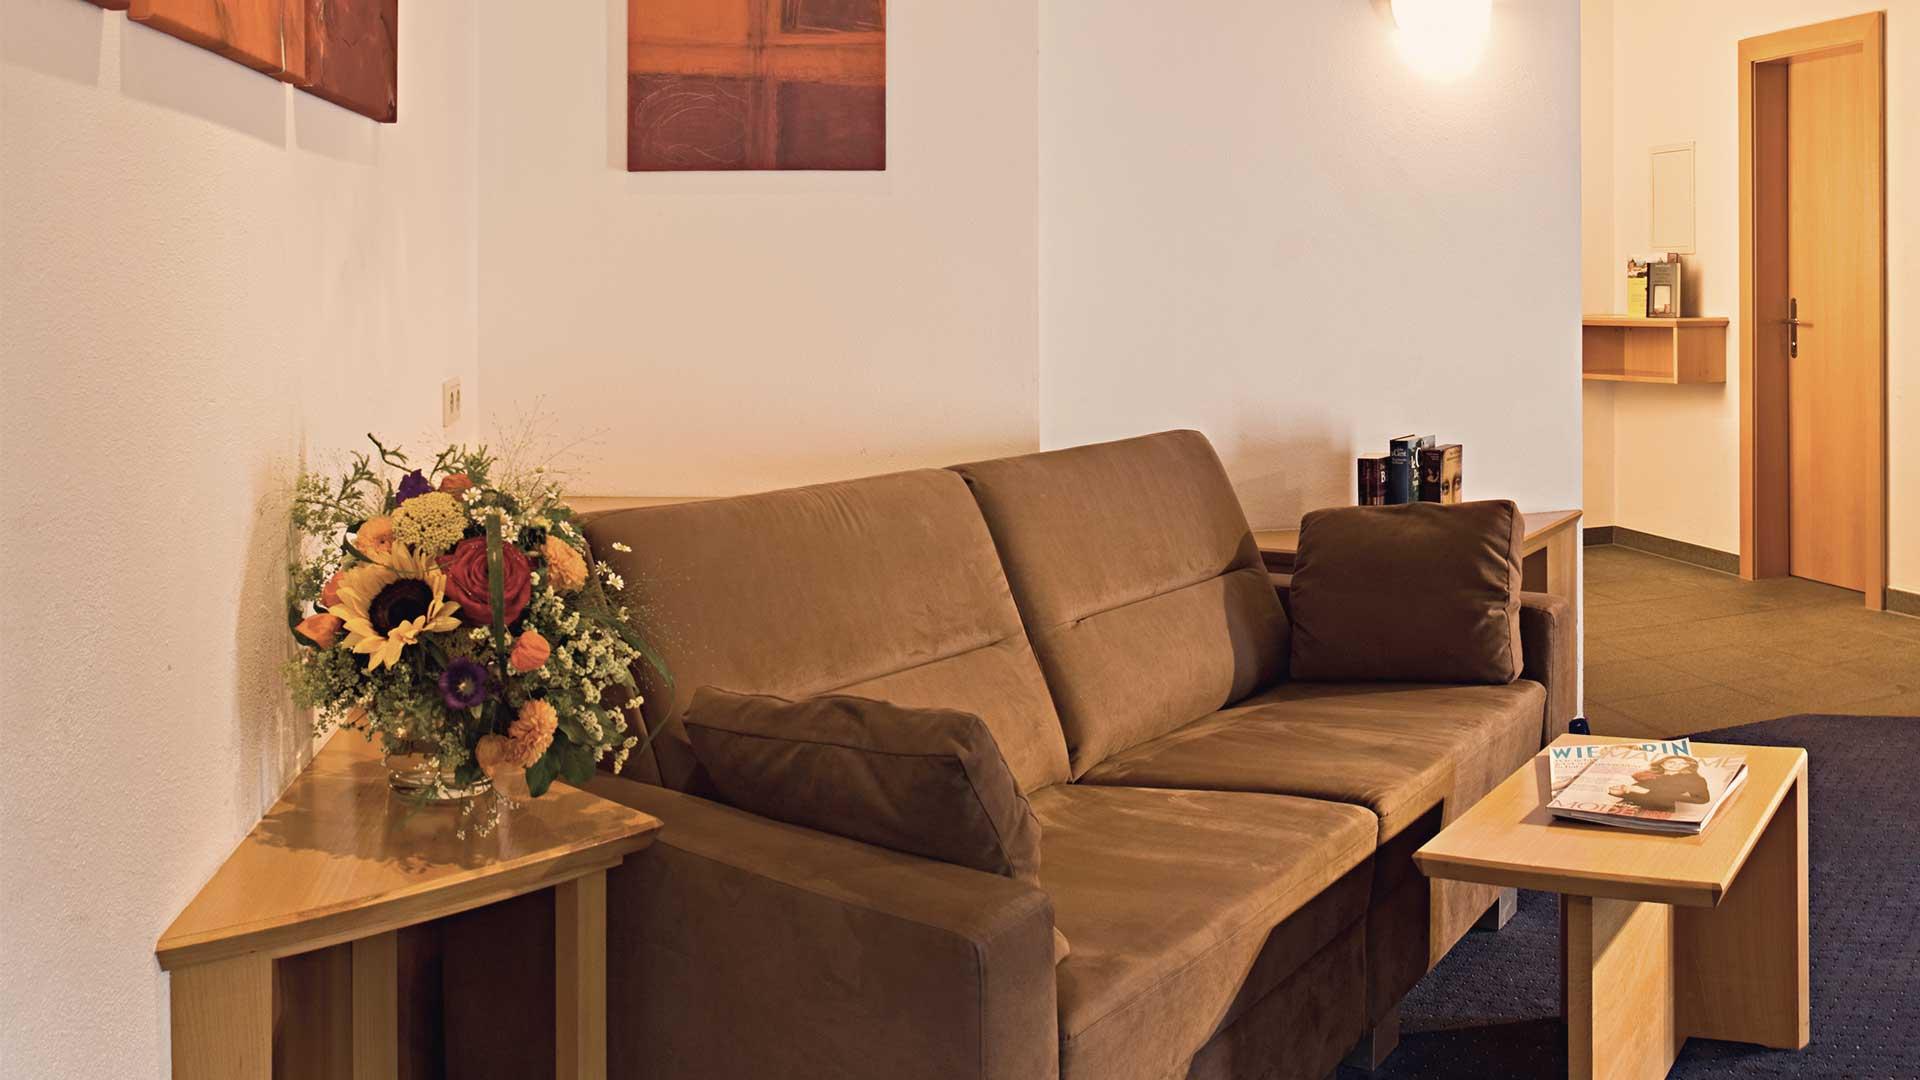 Couch Gradiva Apartments